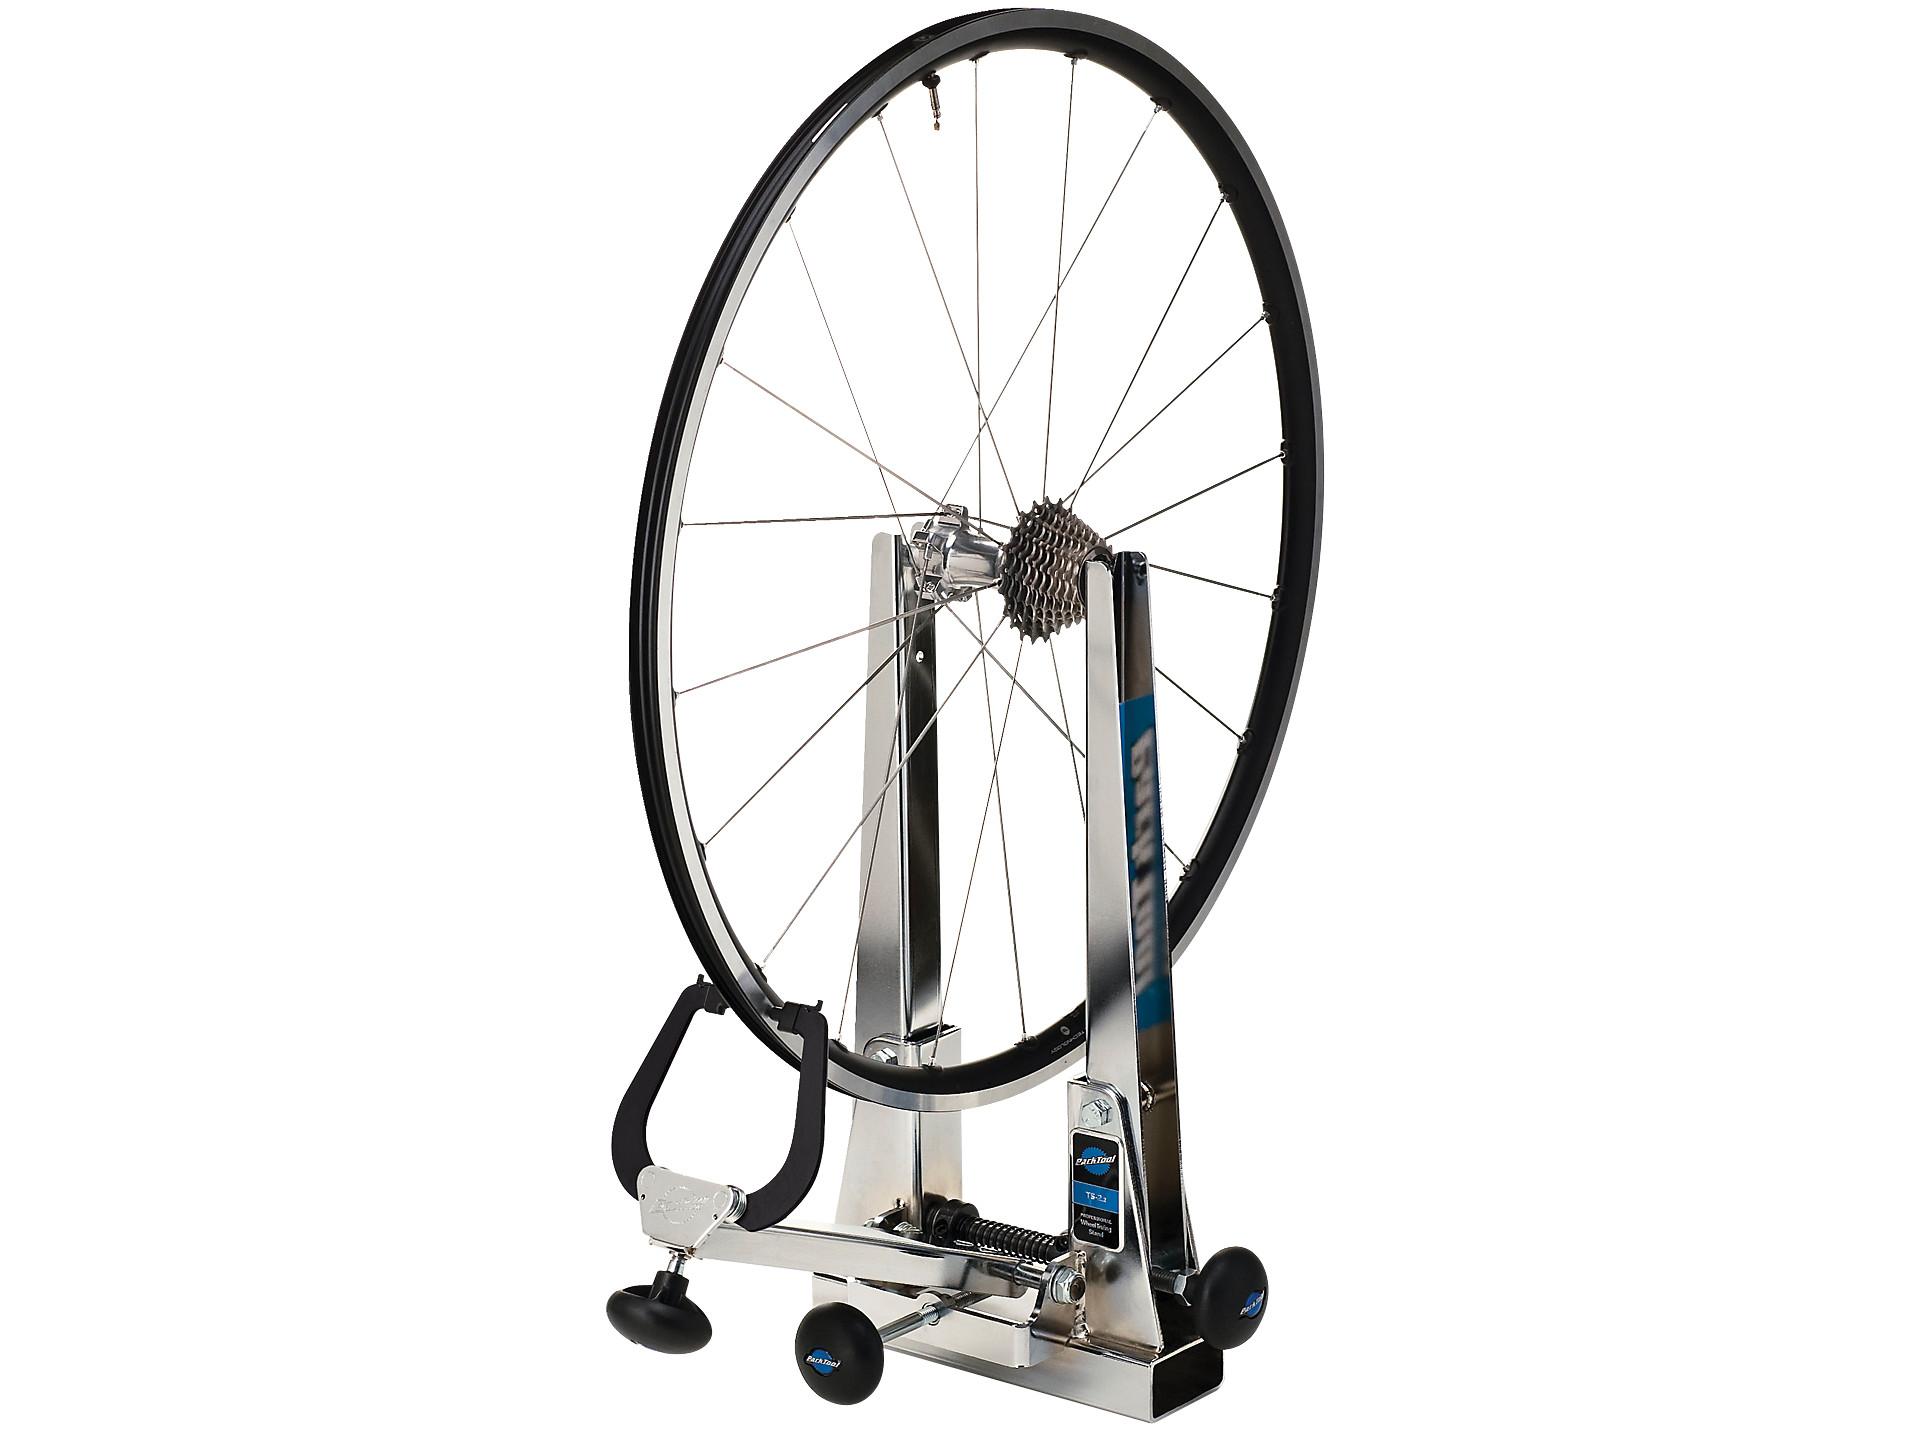 Mechanic Truing Stand Repair Tool Adapter Cycling Repair Truing Stand Kit New